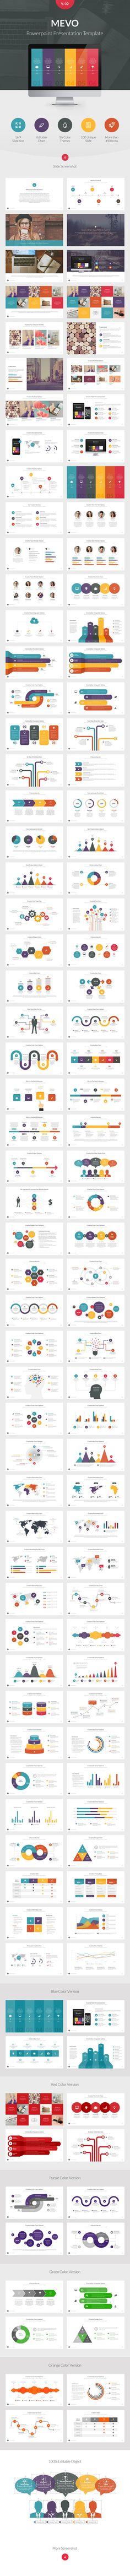 Mevo Powerpoint Presentation Template PowerPoint Template / Theme / Presentation / Slides / Background / Power Point #powerpoint #template #theme